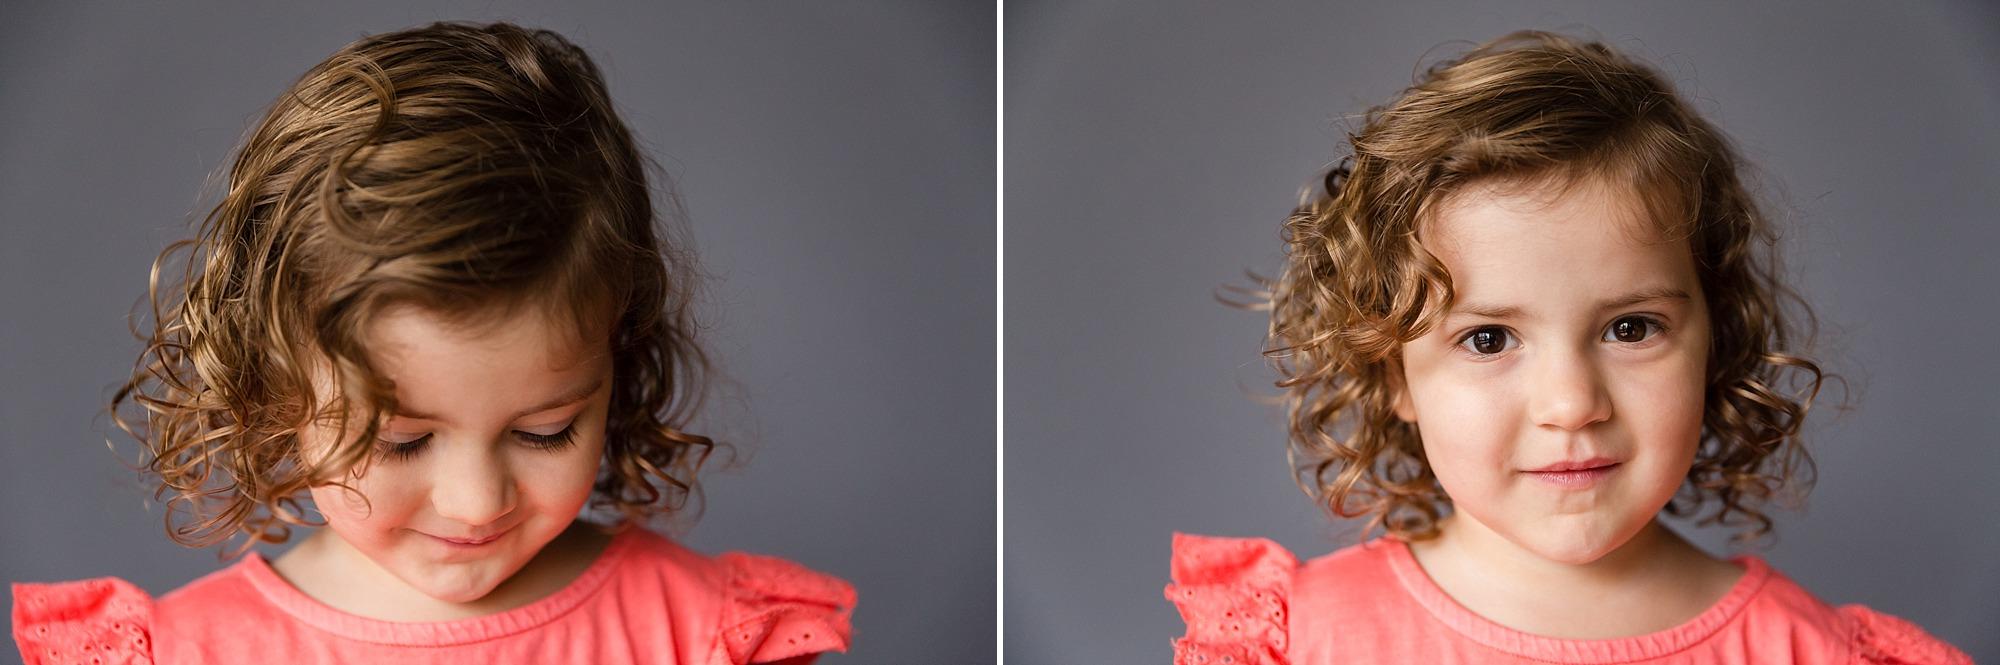 Modern_Childrens_Portraits_Hunnicutt_Photography_Collages_0010